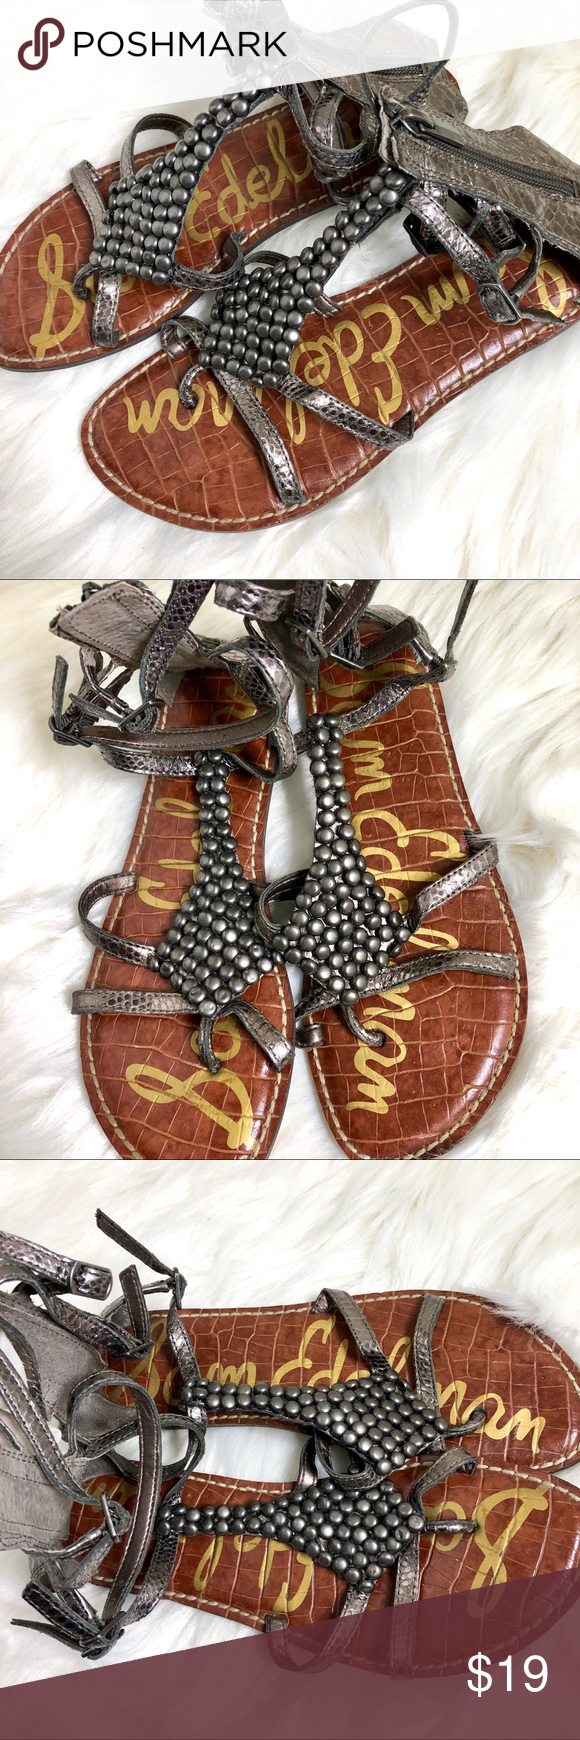 6 Ginger Sam Size Sandals Beaded Gladiator Edelman Hqrdctsx TFJK1c3l